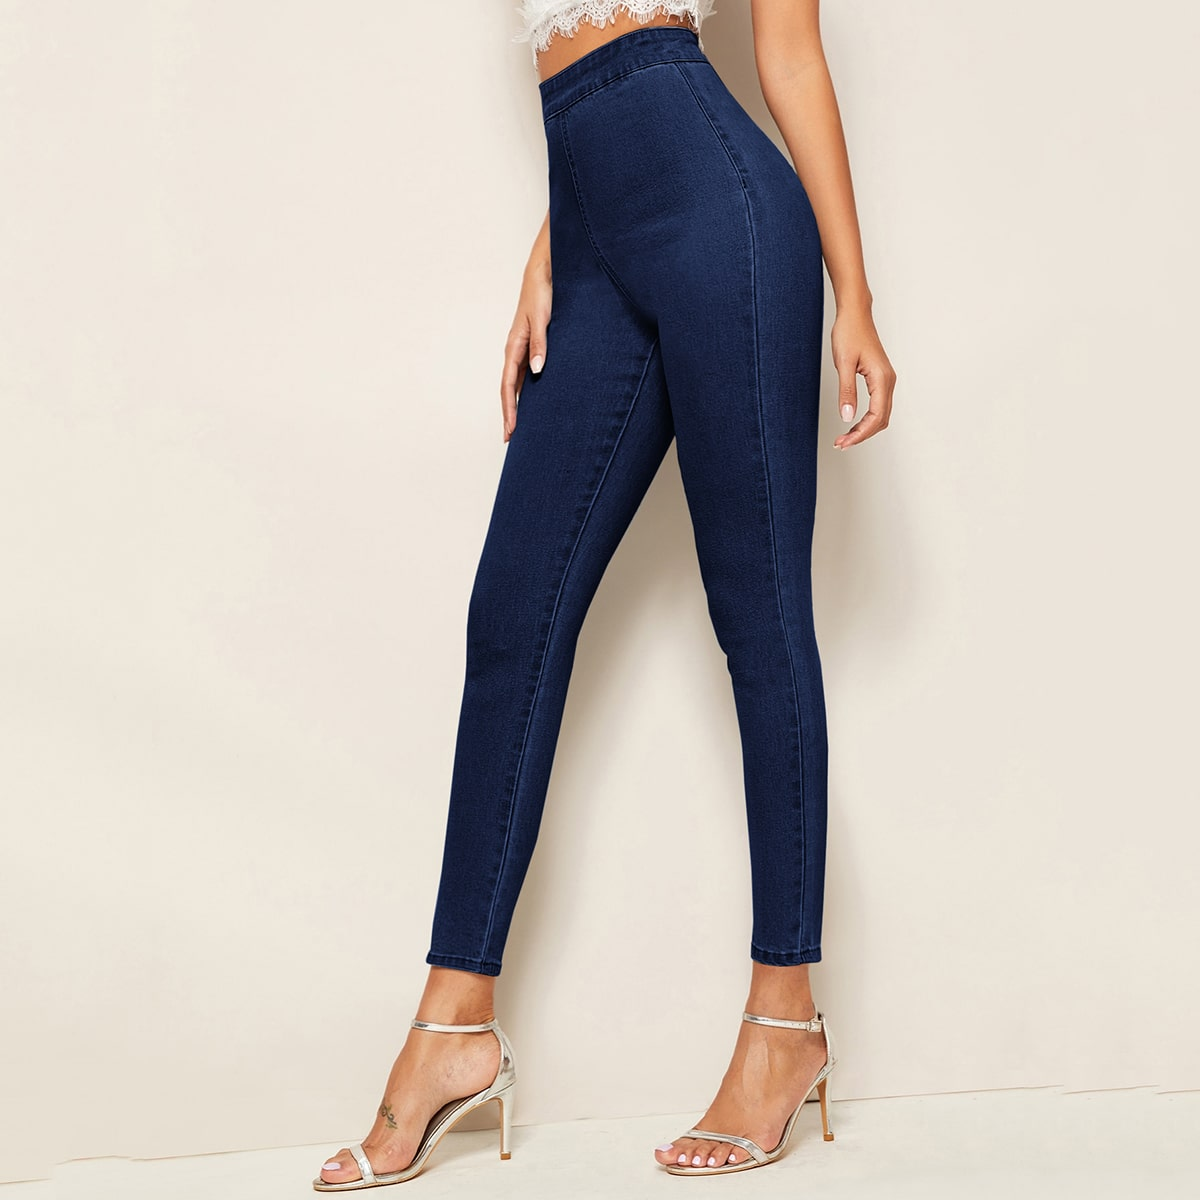 Dark Wash High-Waisted High Stretch Skinny Jeans